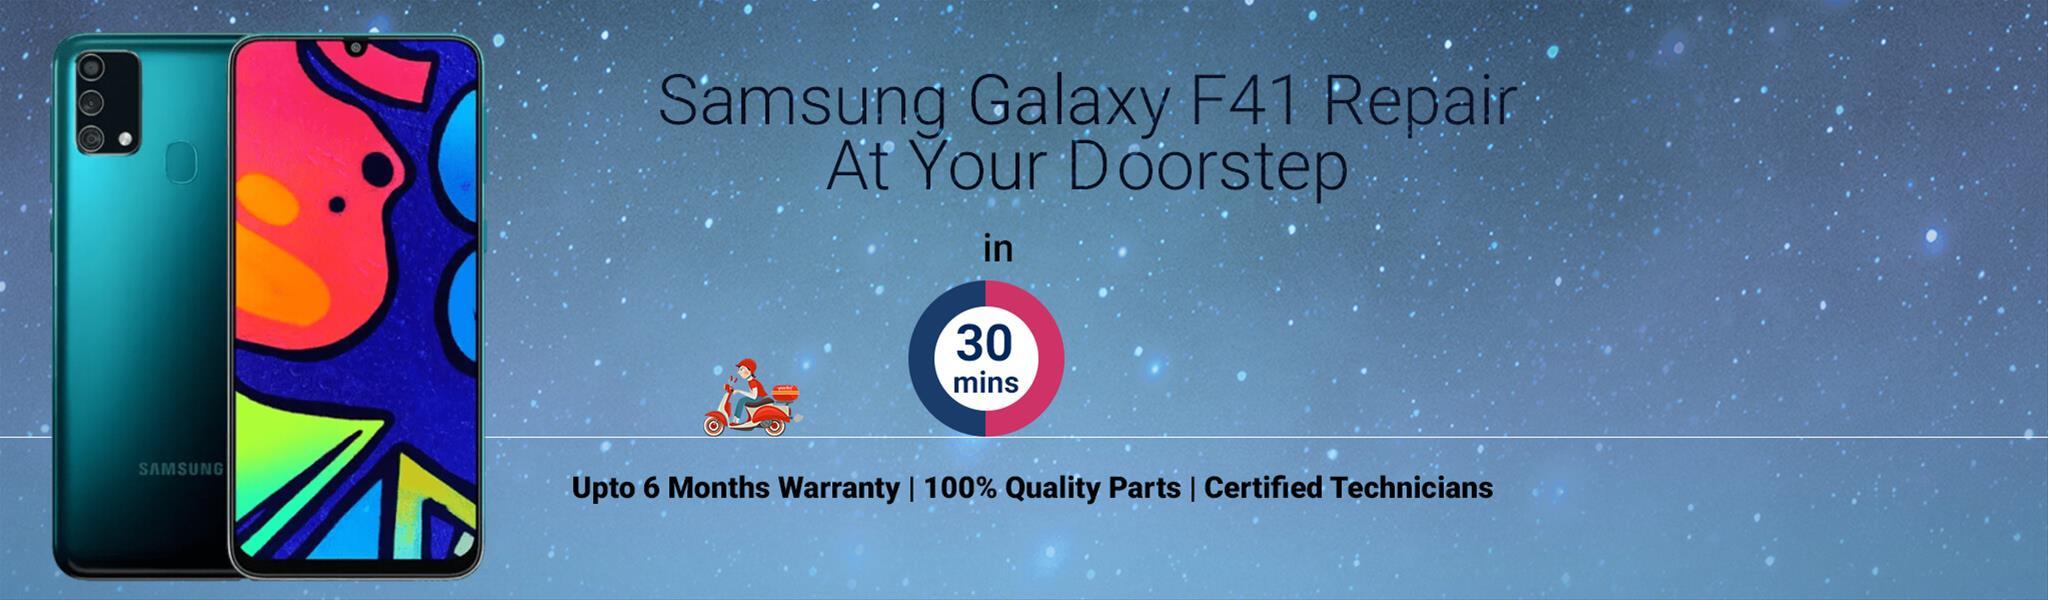 Samsung-F41-repair.jpg